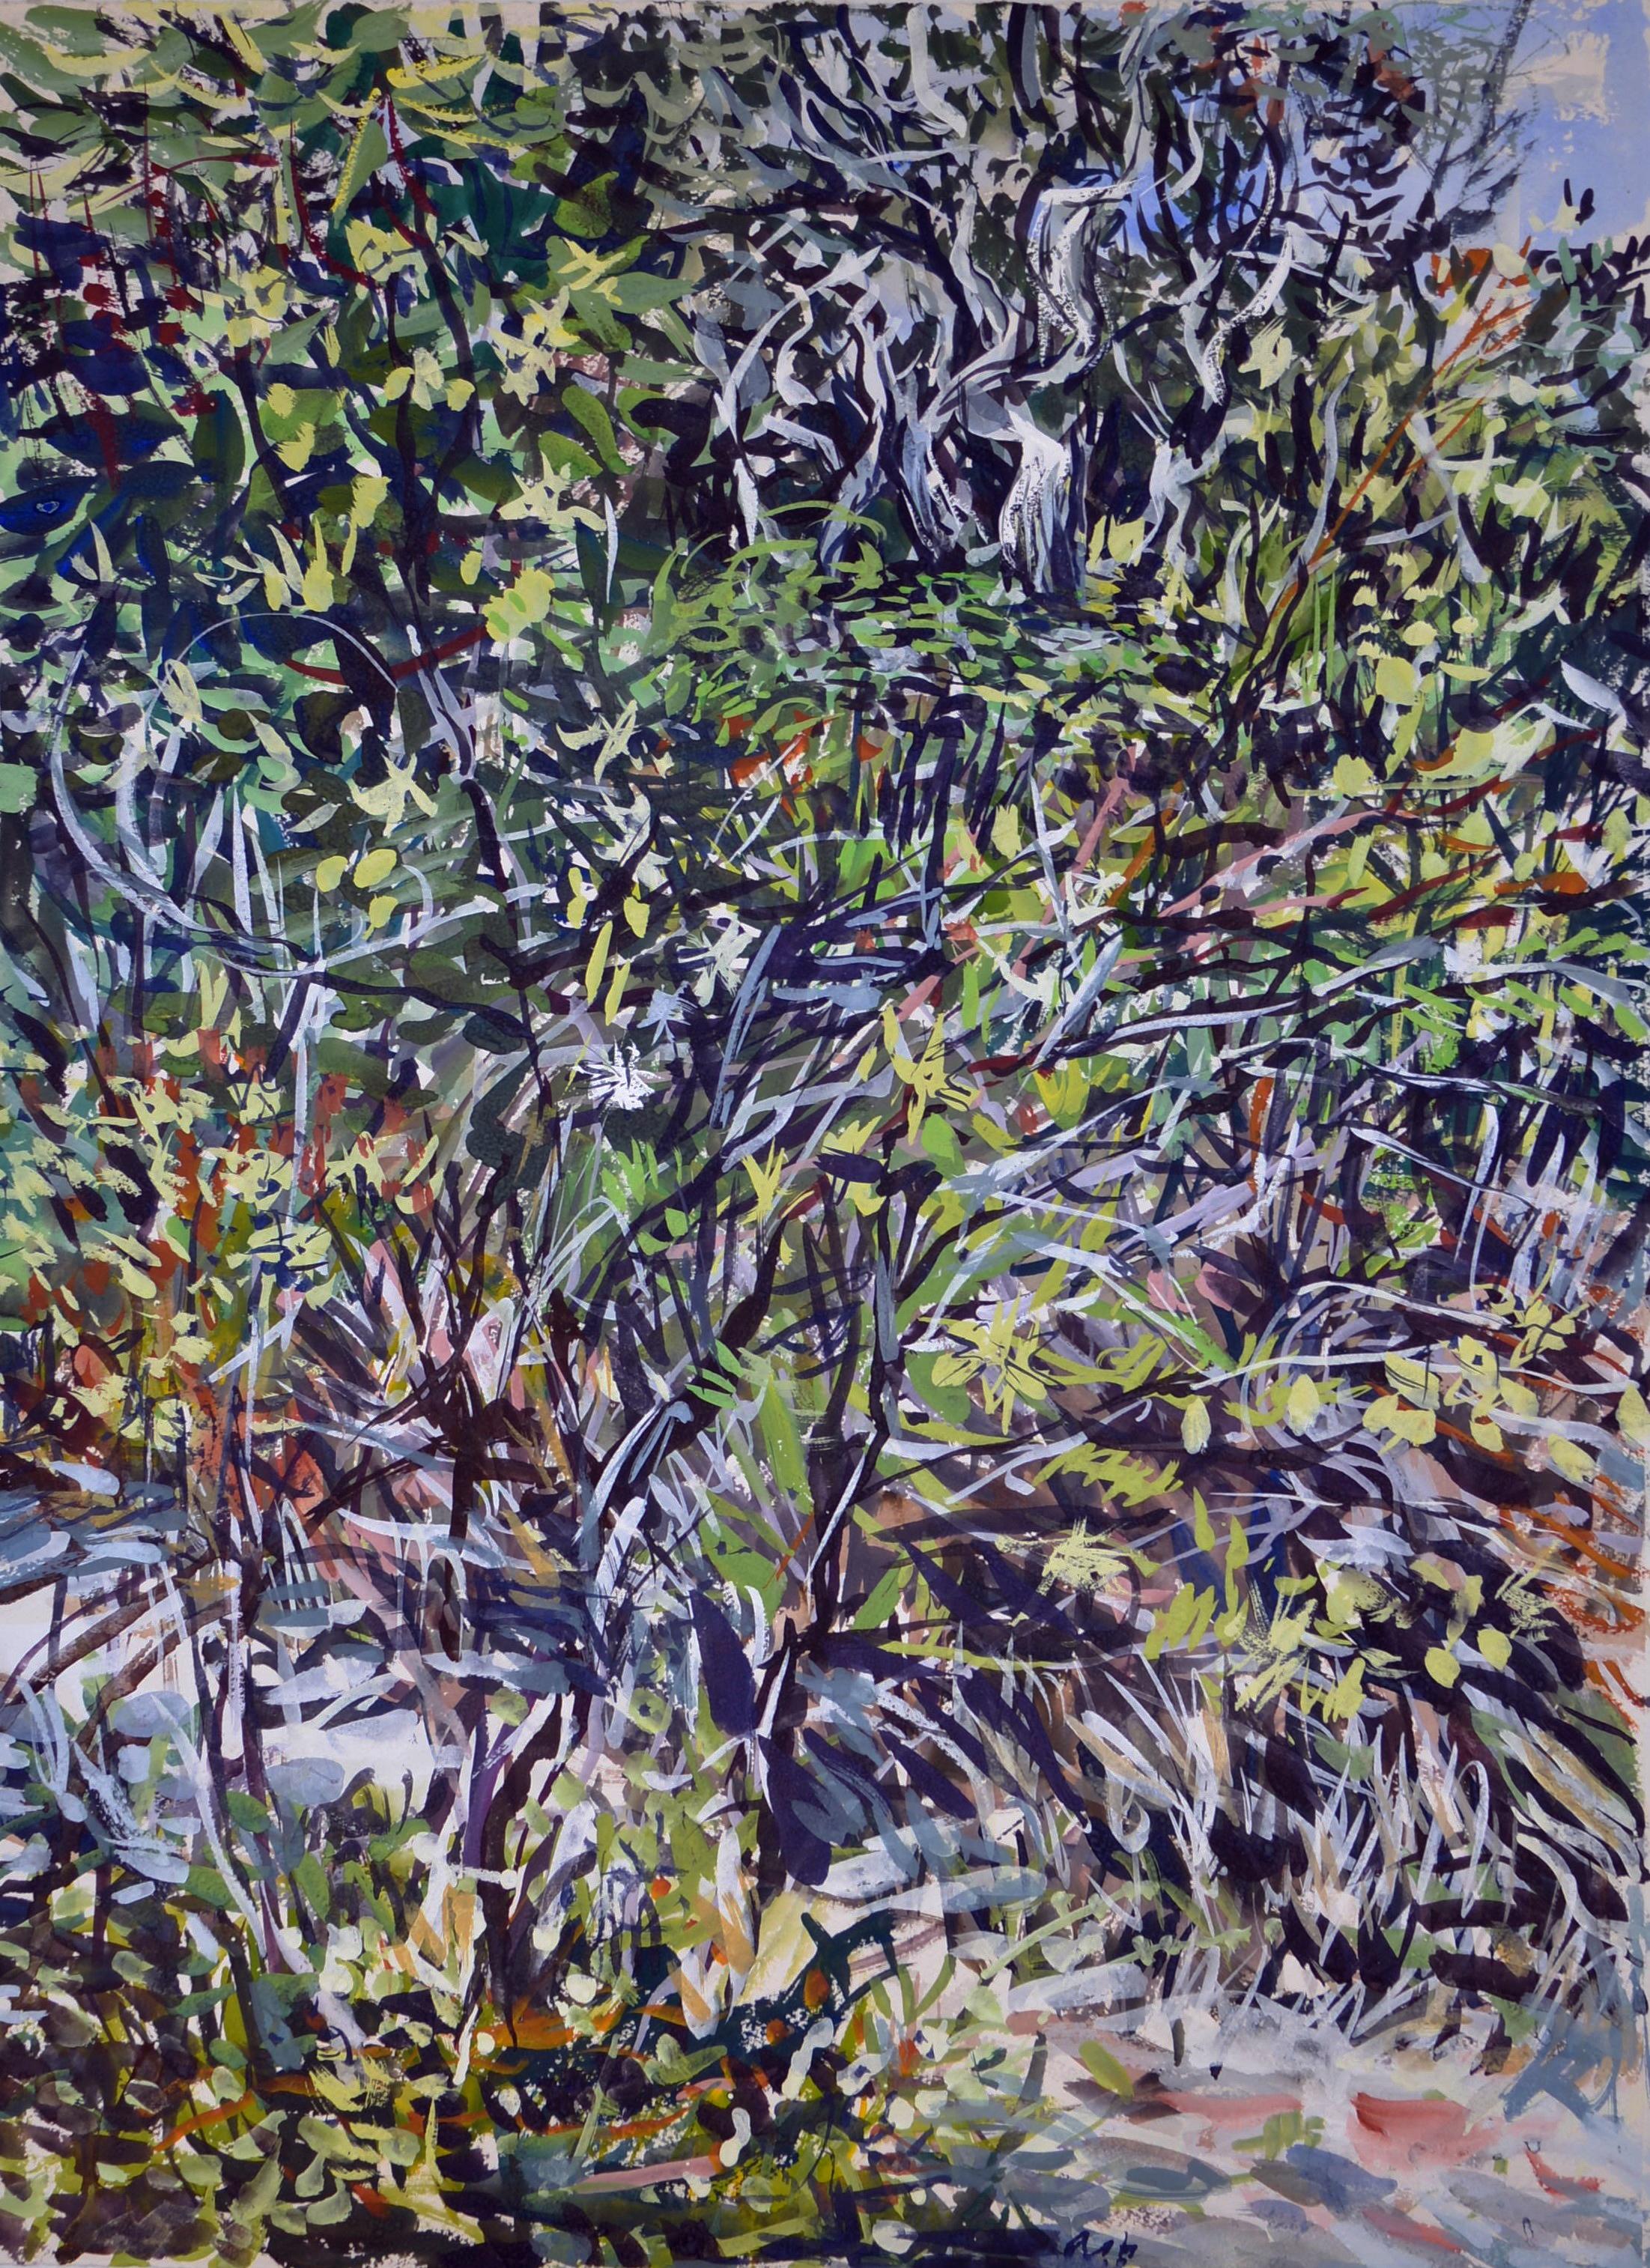 Wallum Landscape 1 (Kathlene McArthur Reserve) 2018 gouache on rag paper 78 x 57cm